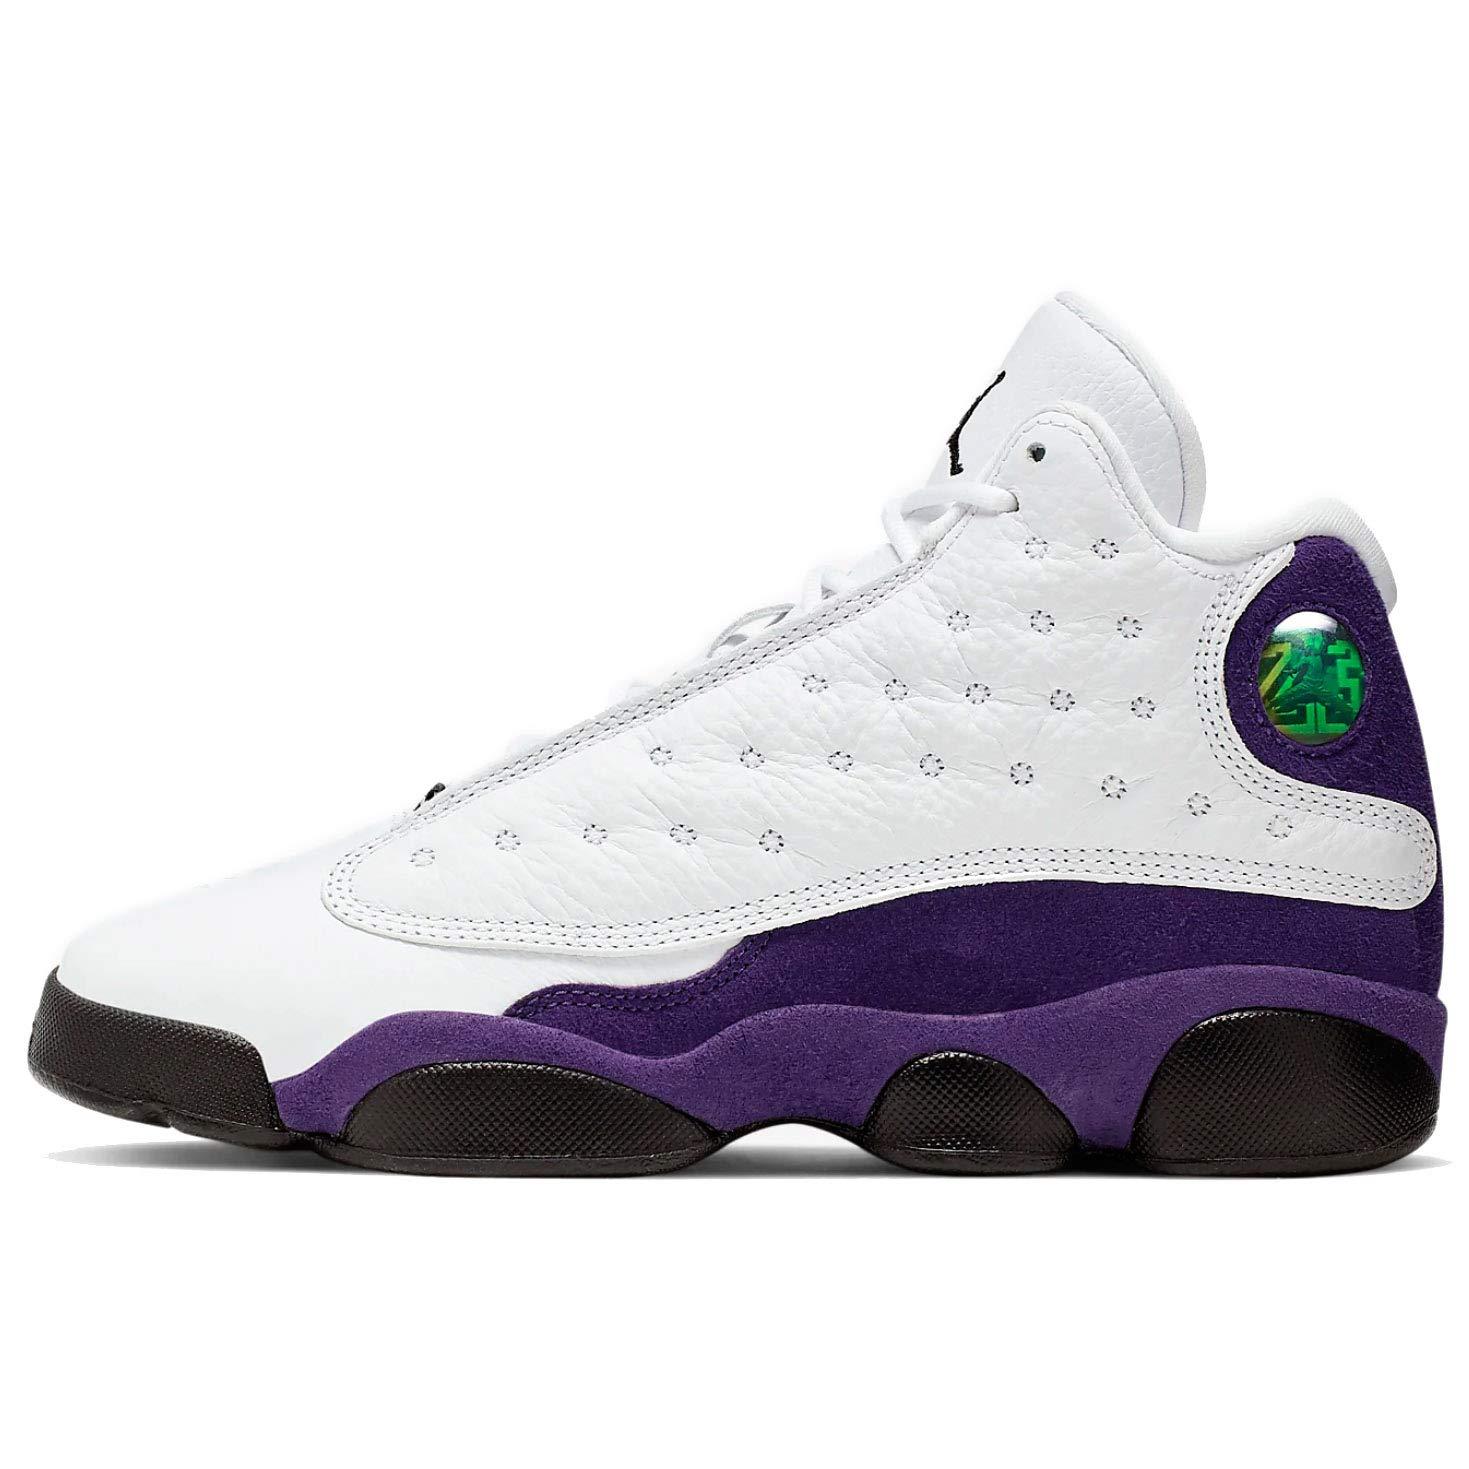 special sales new images of amazing price Amazon.com   Nike Boys Air Jordan 13 Retro (gs) Shoe Kids ...